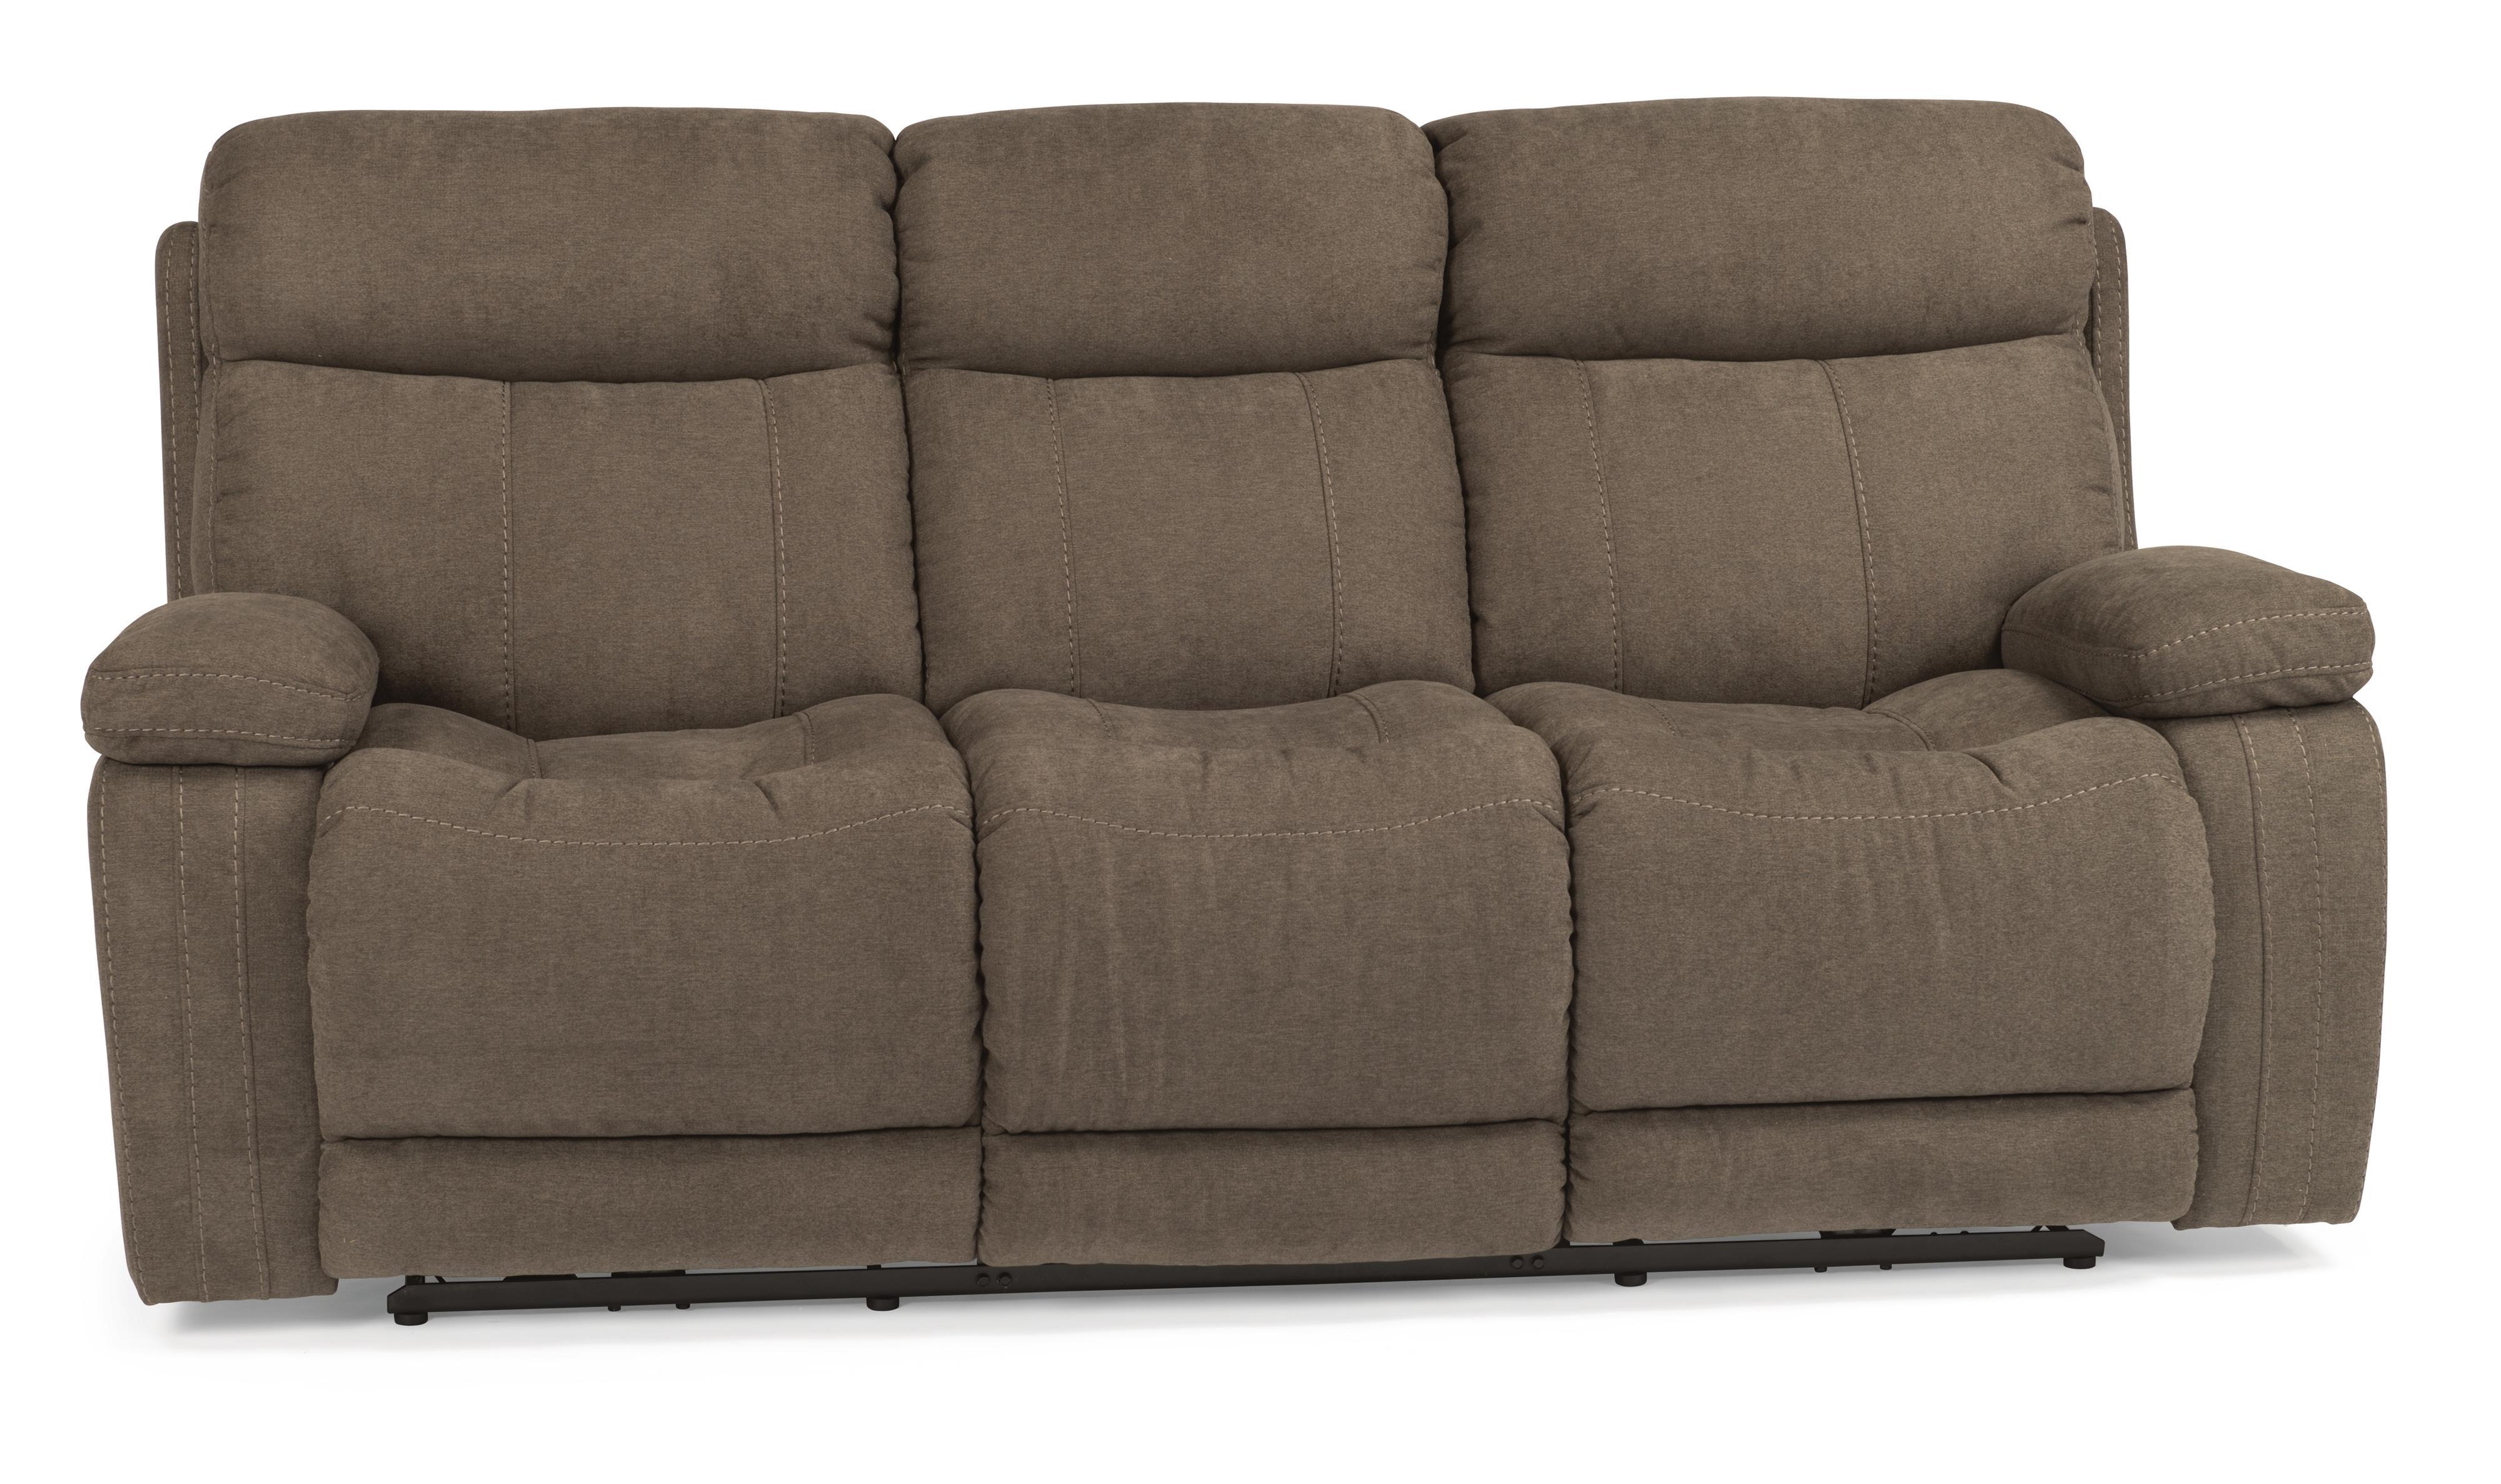 Flexsteel Latitudes-Danika Power Reclining Sofa - Item Number: 1484-62P-414-02